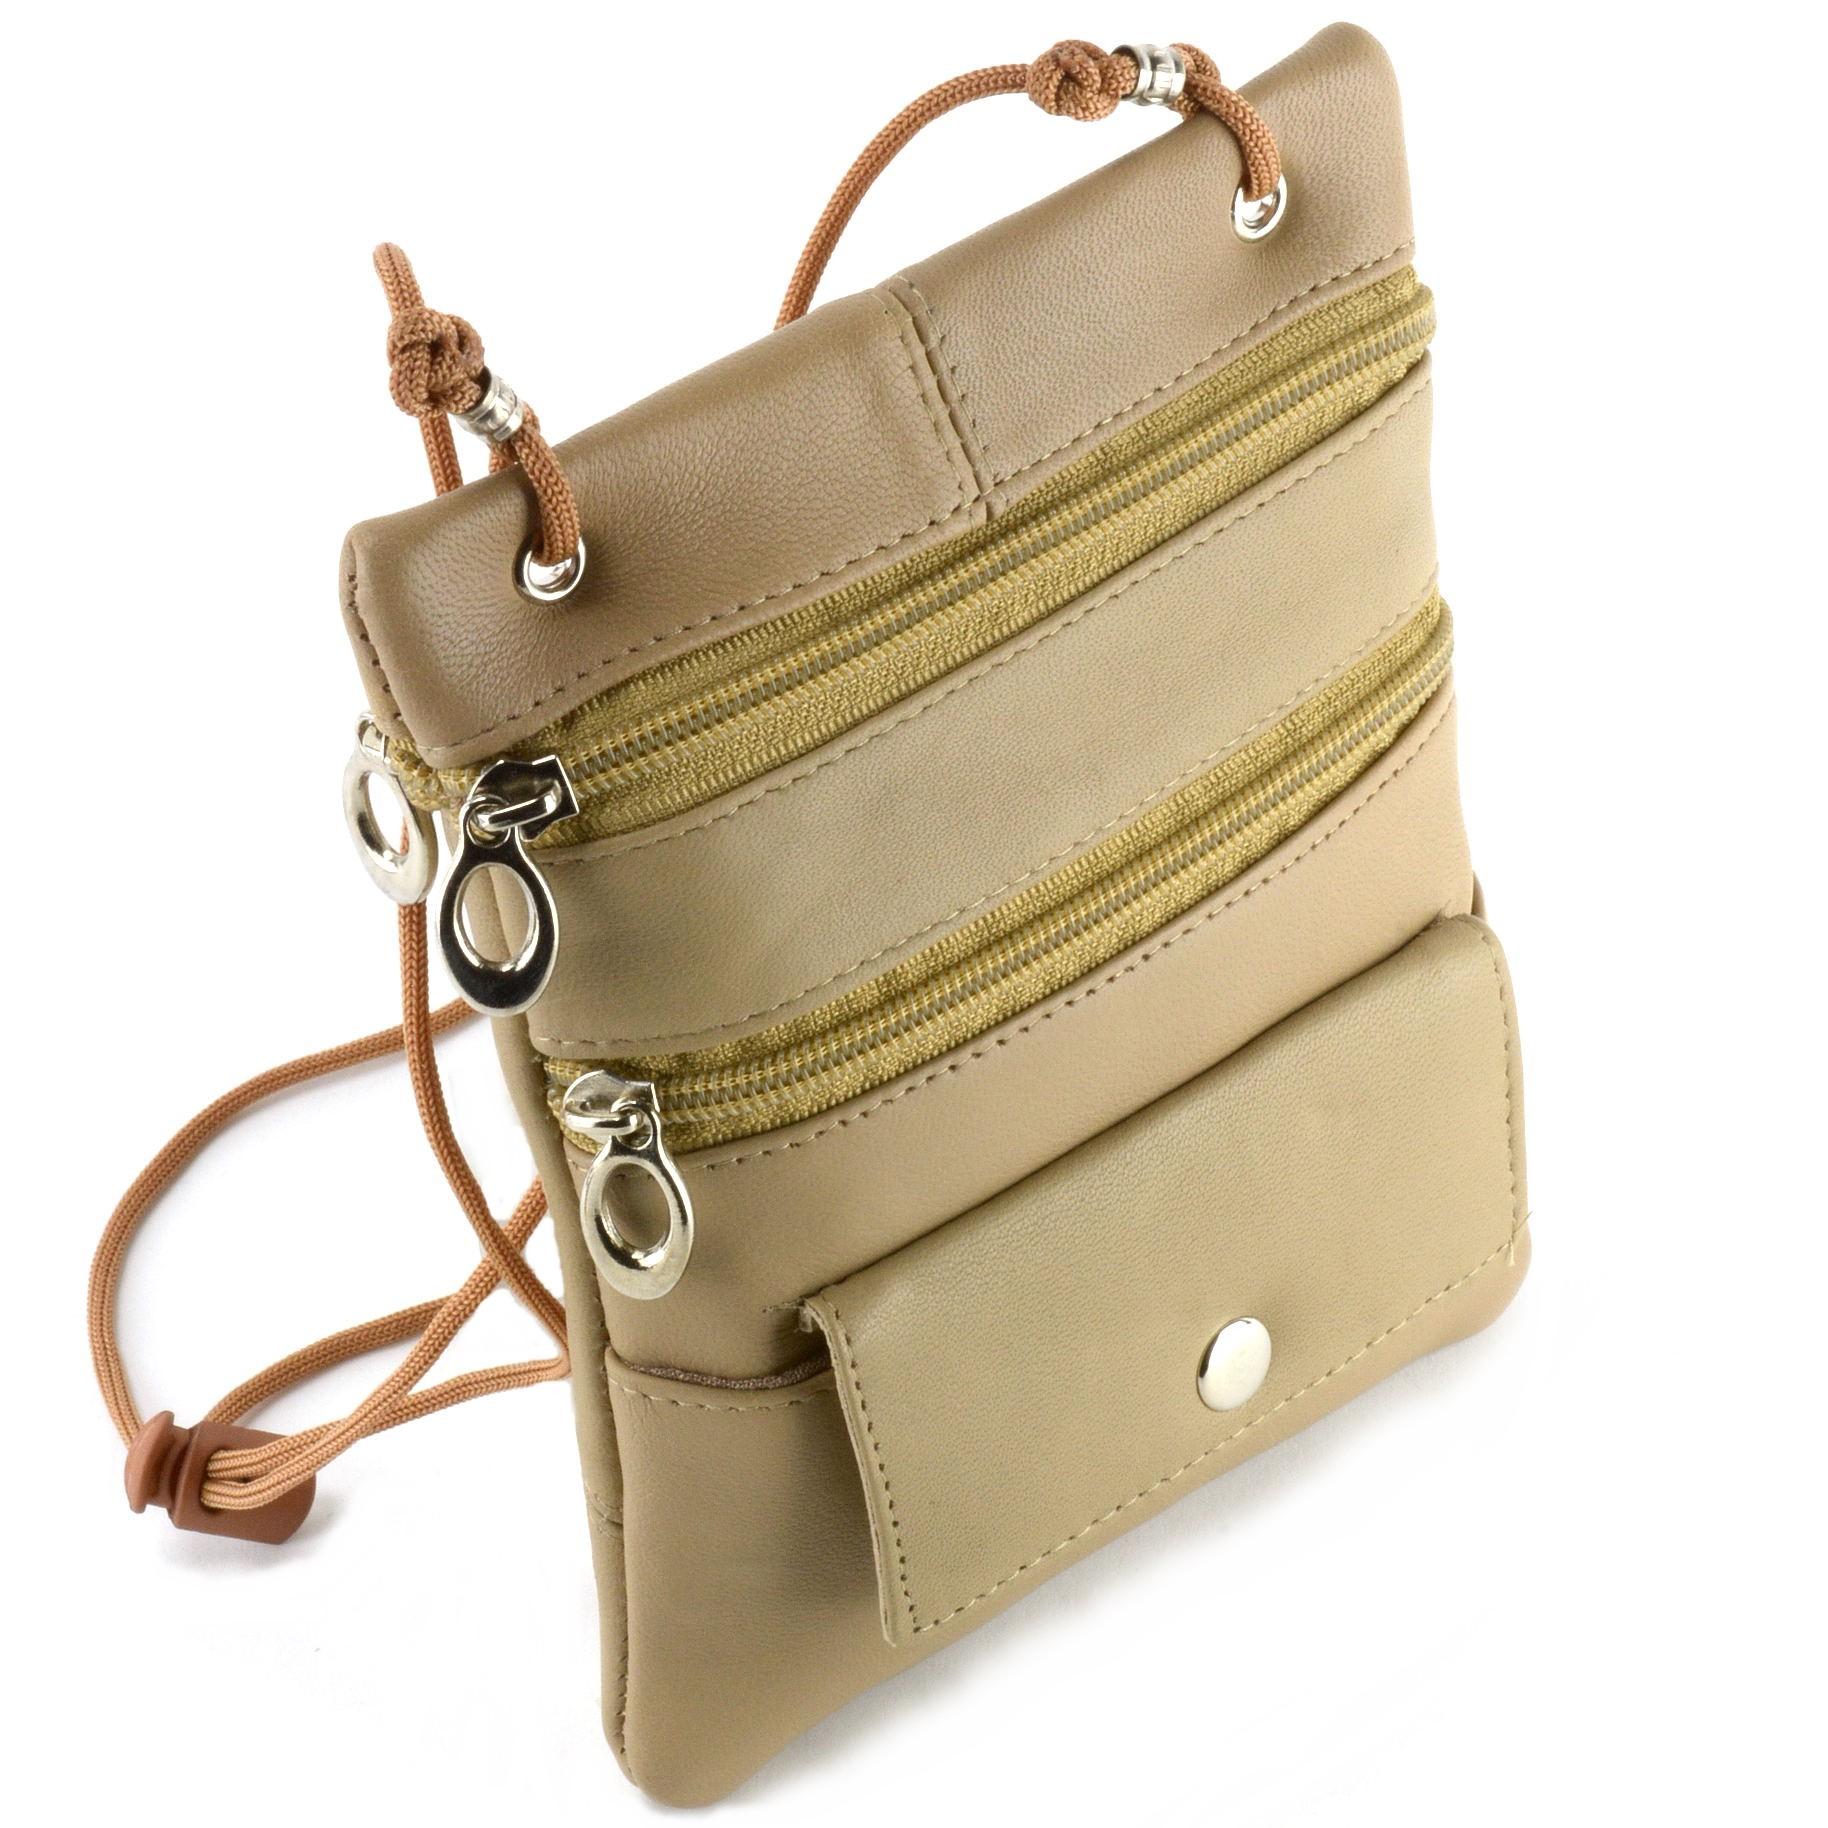 Soft-Leather-Purse-Organizer-Shoulder-Bag-4-Pocket-Micro-Handbag-Travel-Wallet thumbnail 42